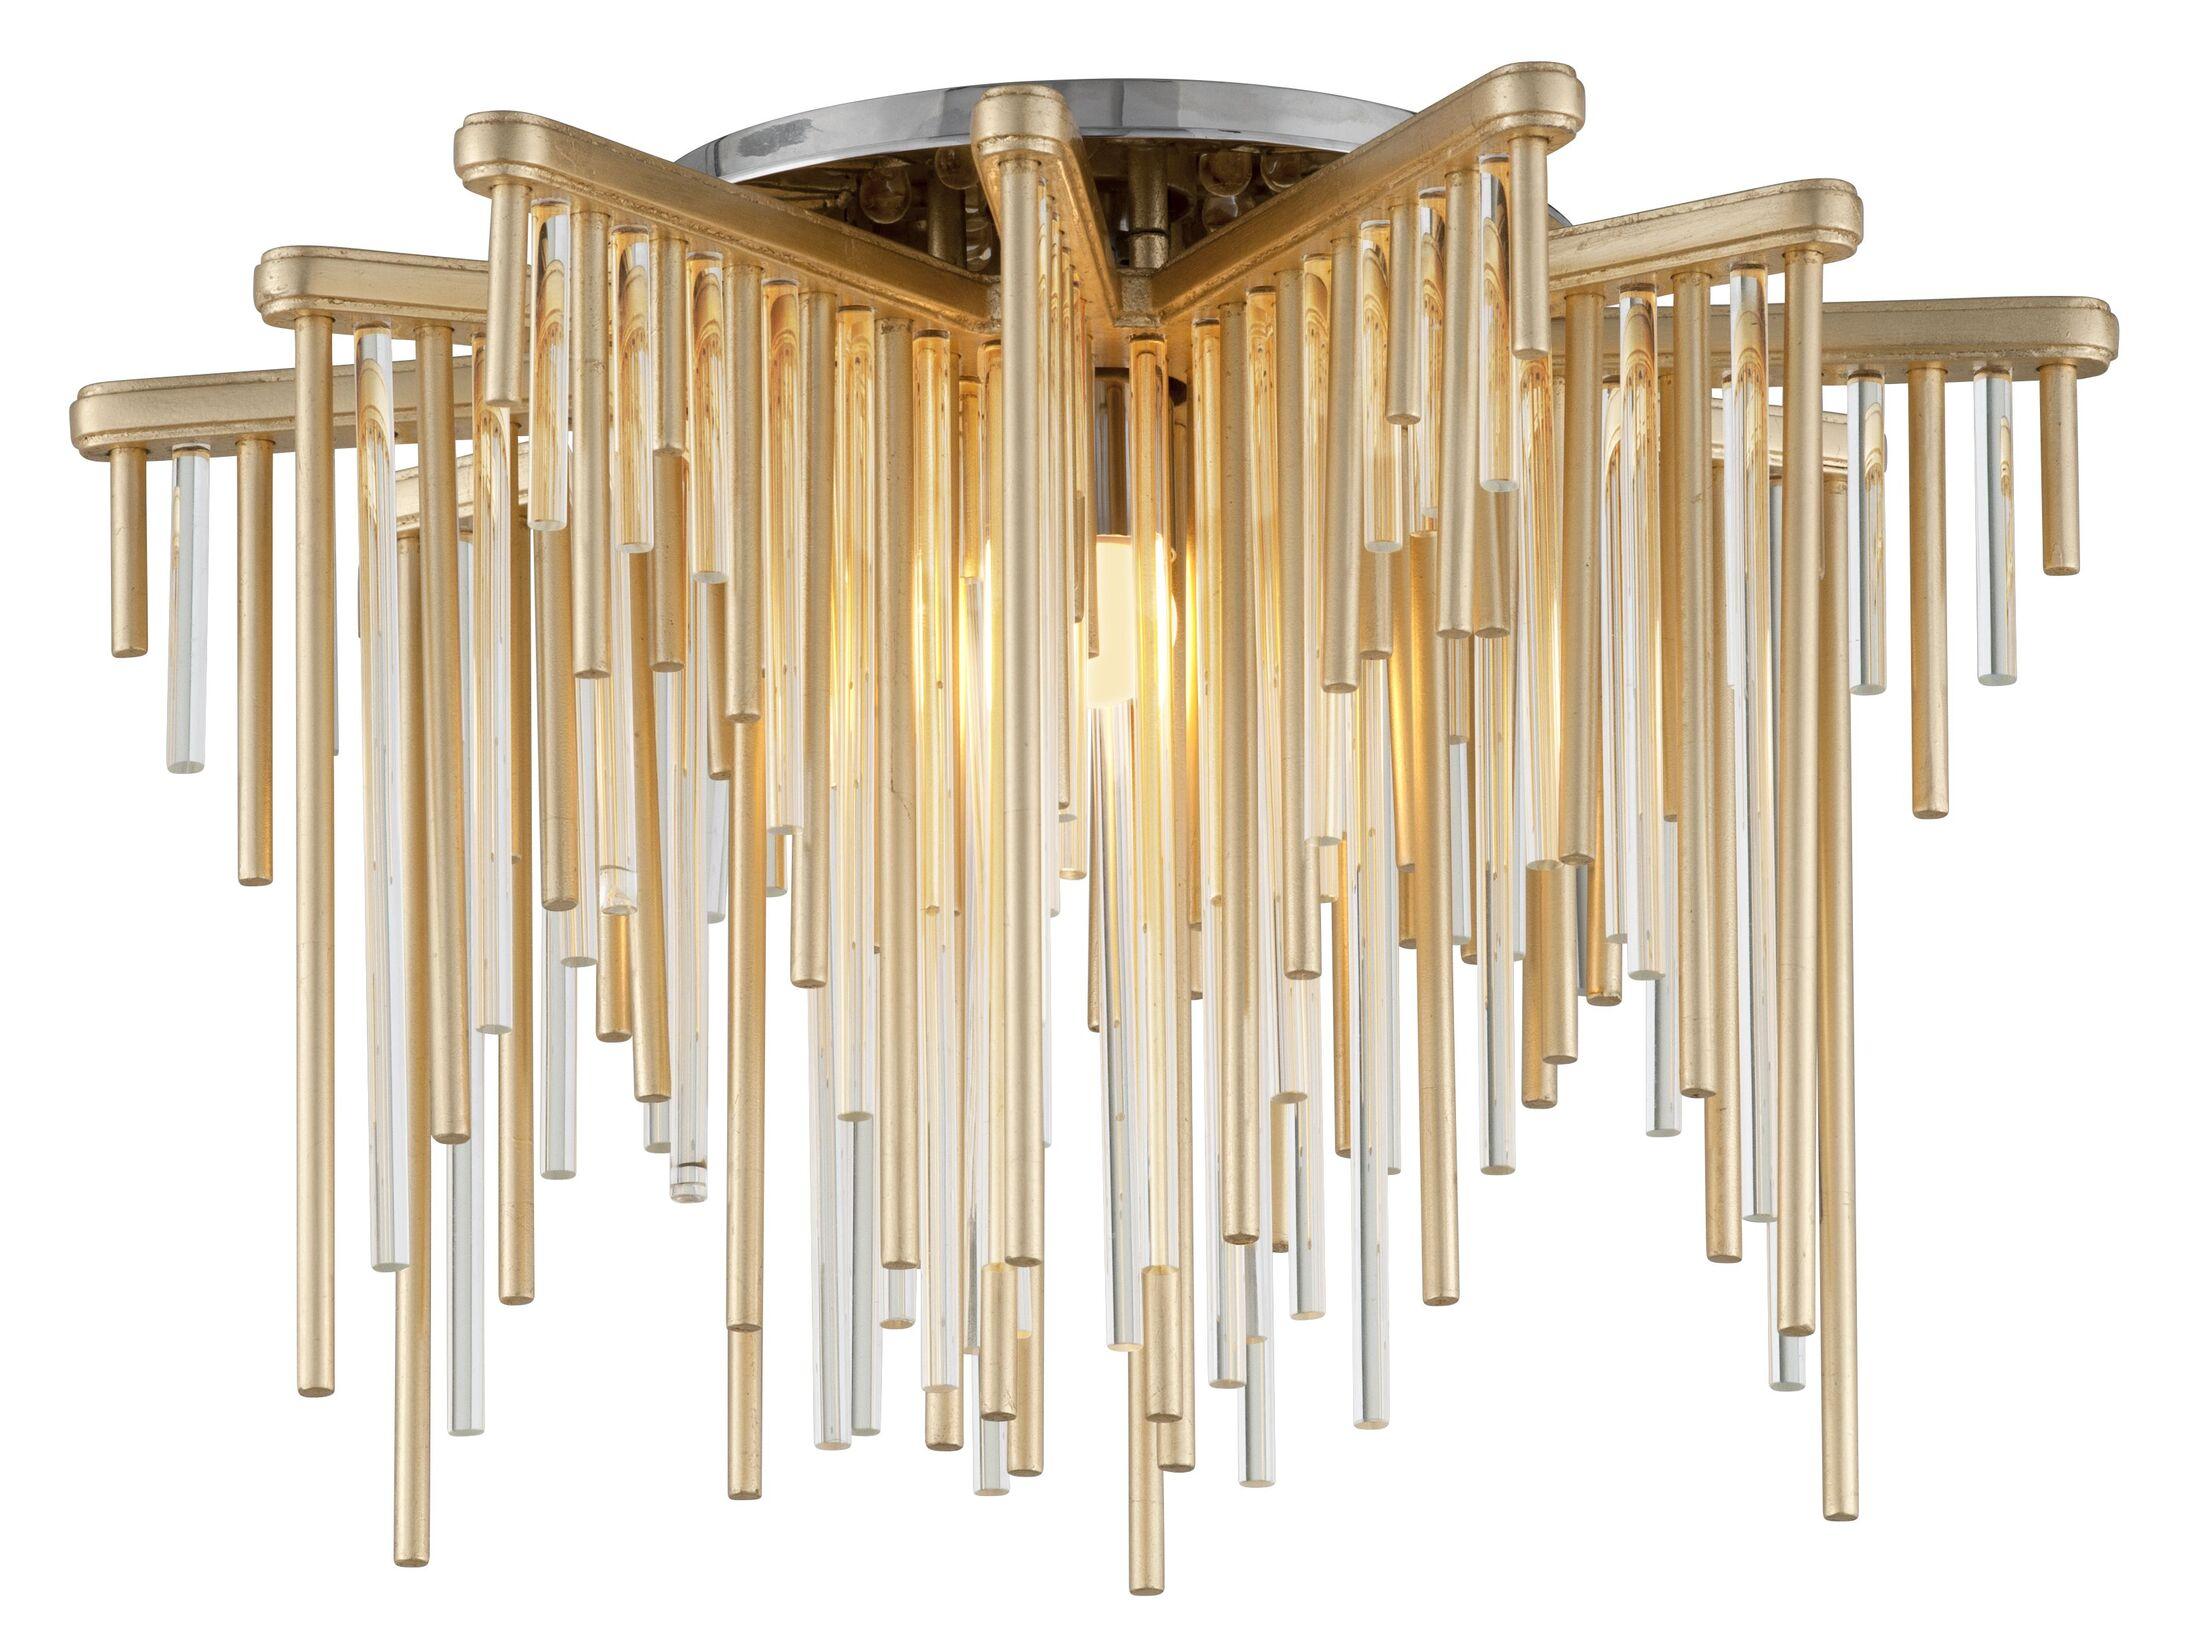 Theory 1-Light LED Semi Flush Mount